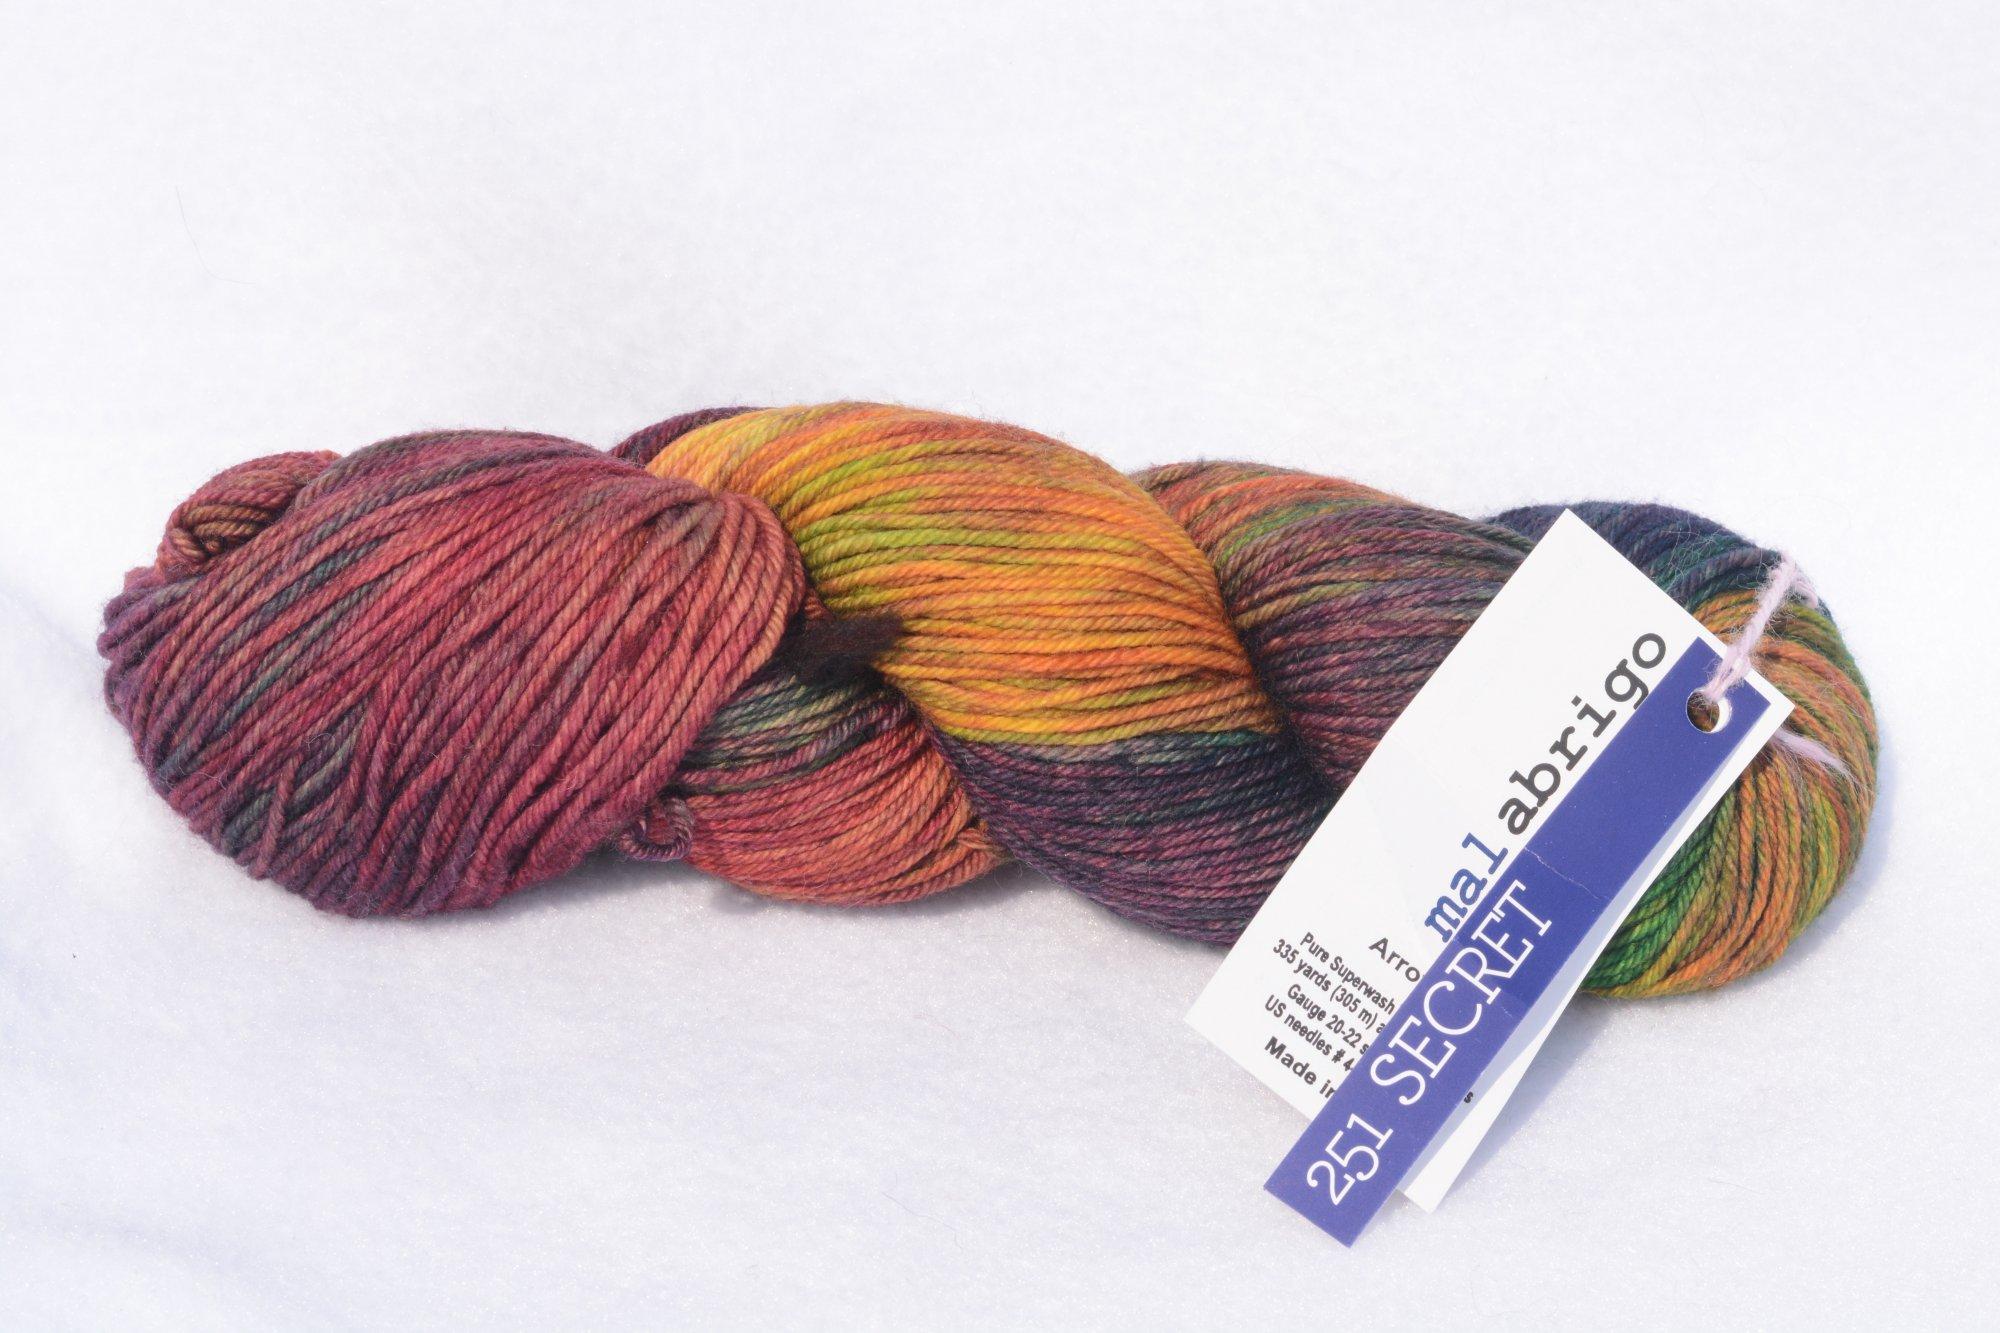 Arroyo - Secret - Color 251